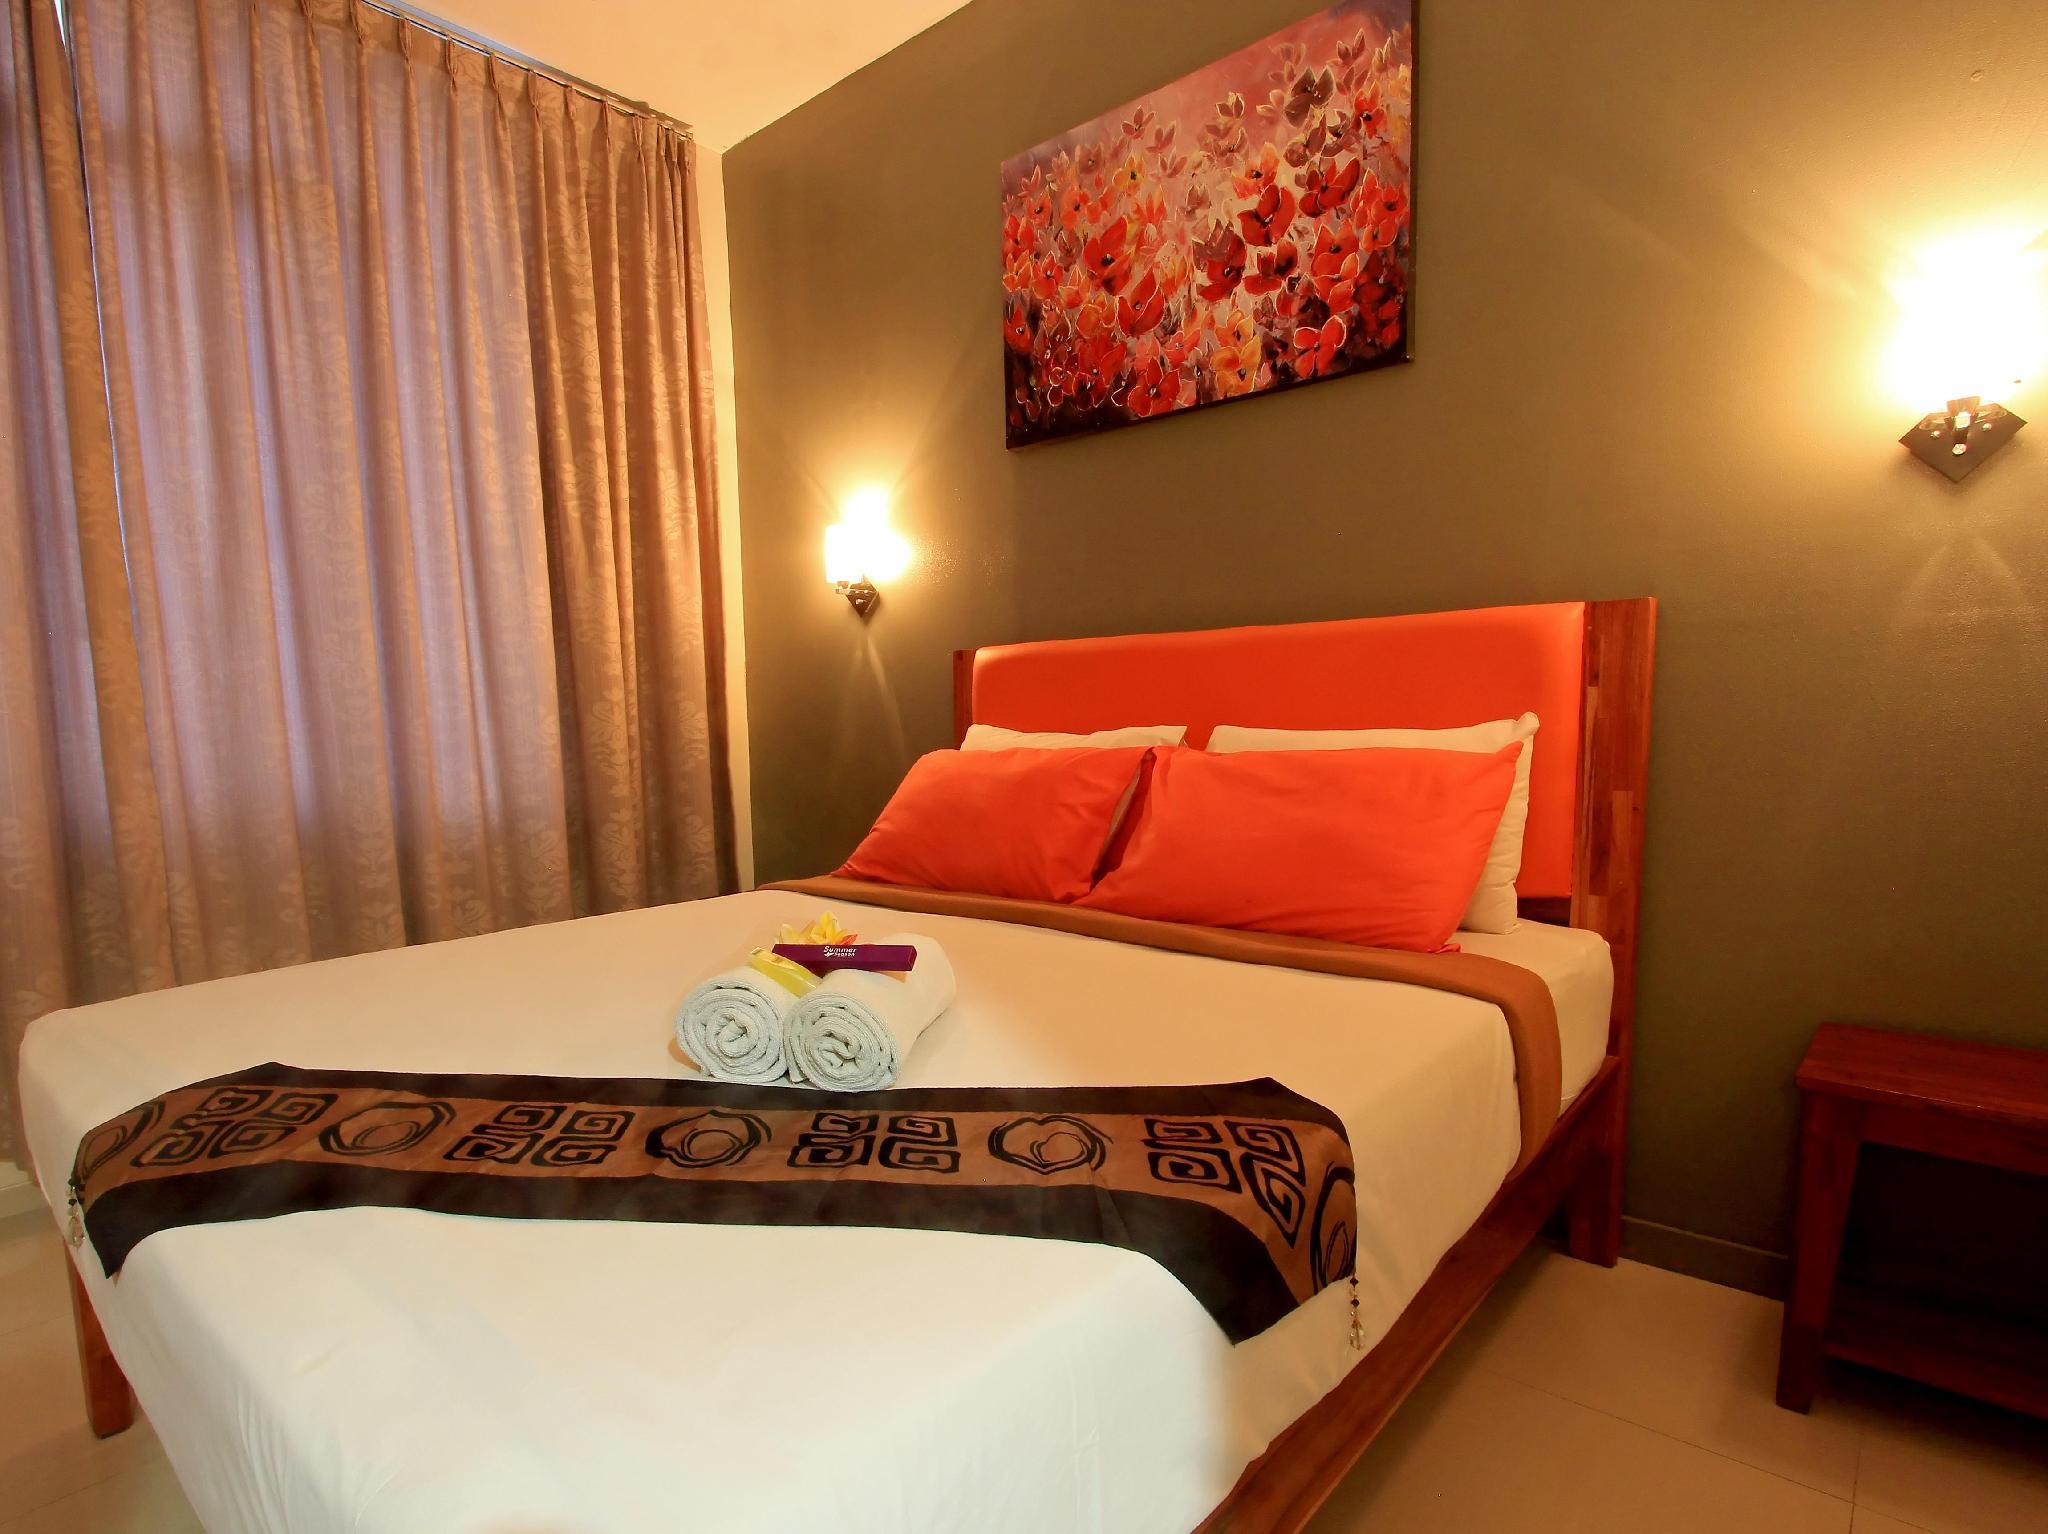 Summer season hotel yogyakarta Рoffres sp̩ciales pour cet h̫tel